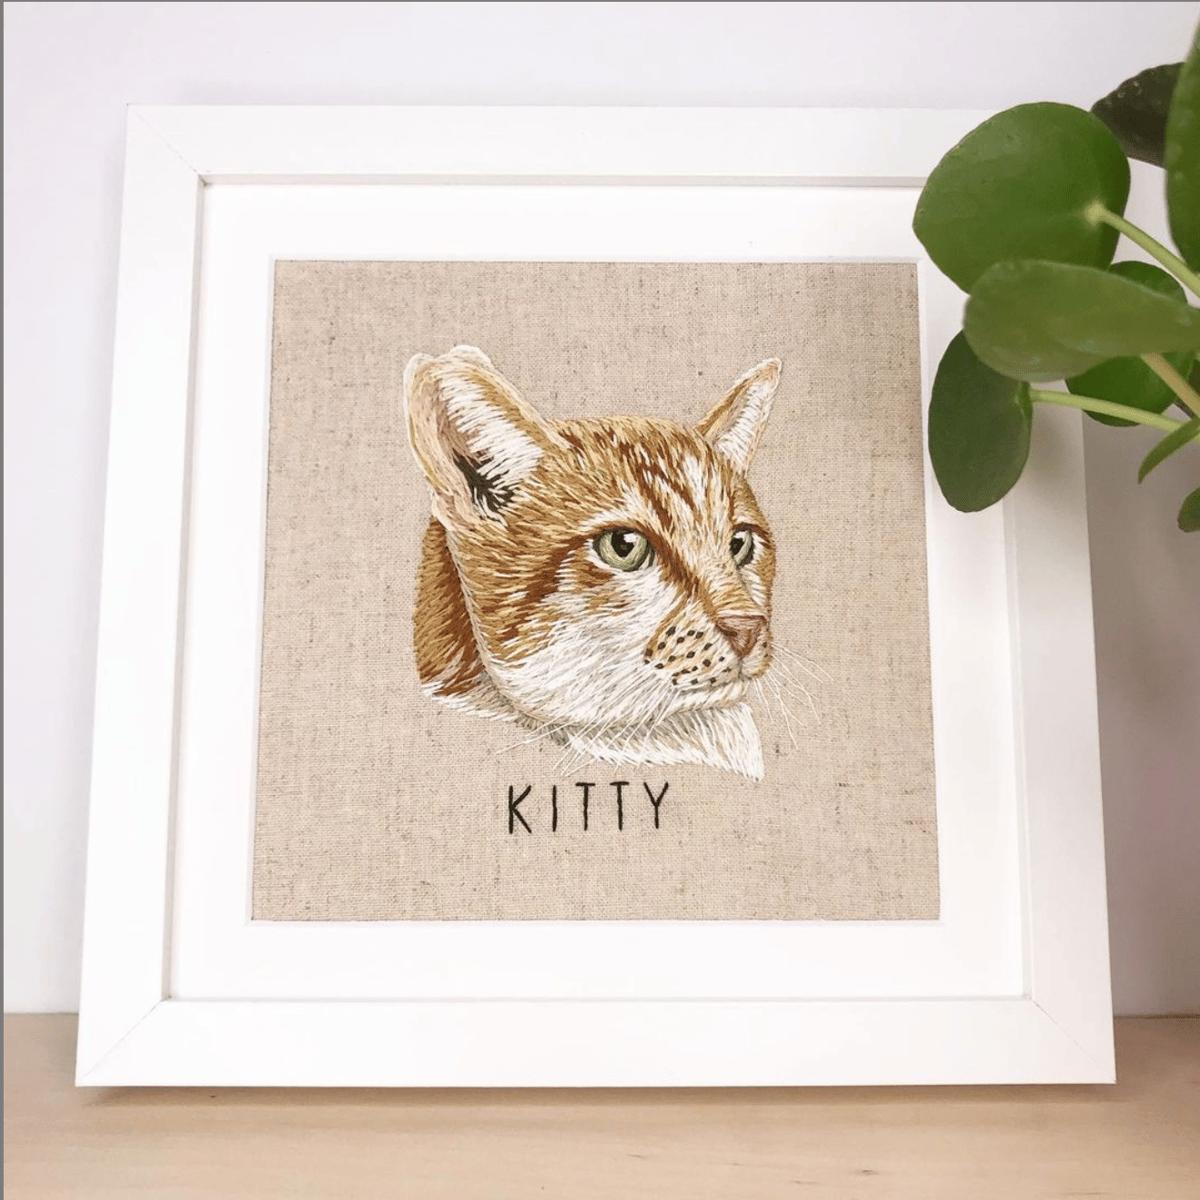 Custom Hand Embroidered Pet Portrait - FRAMED